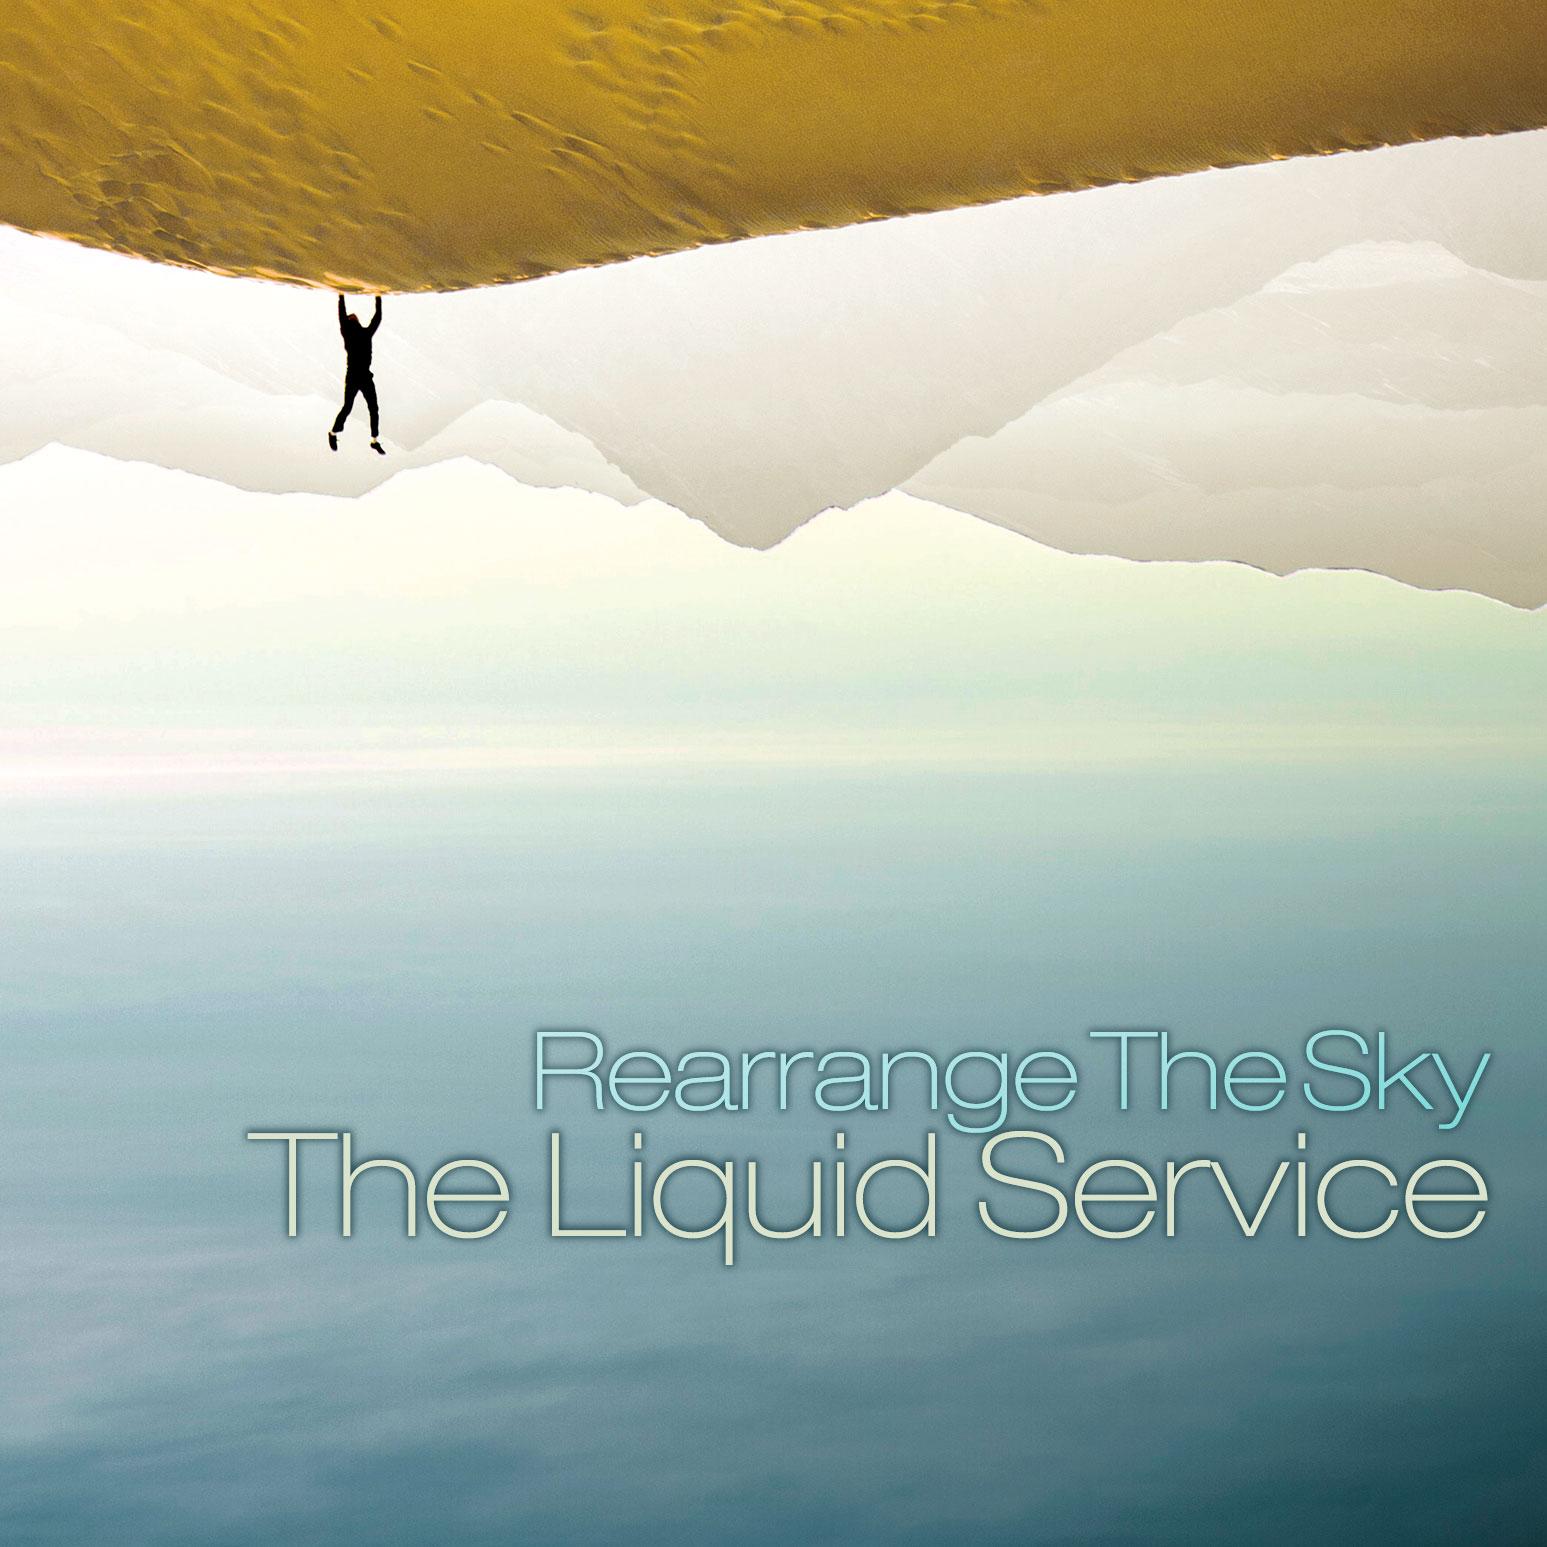 The Liquid Service